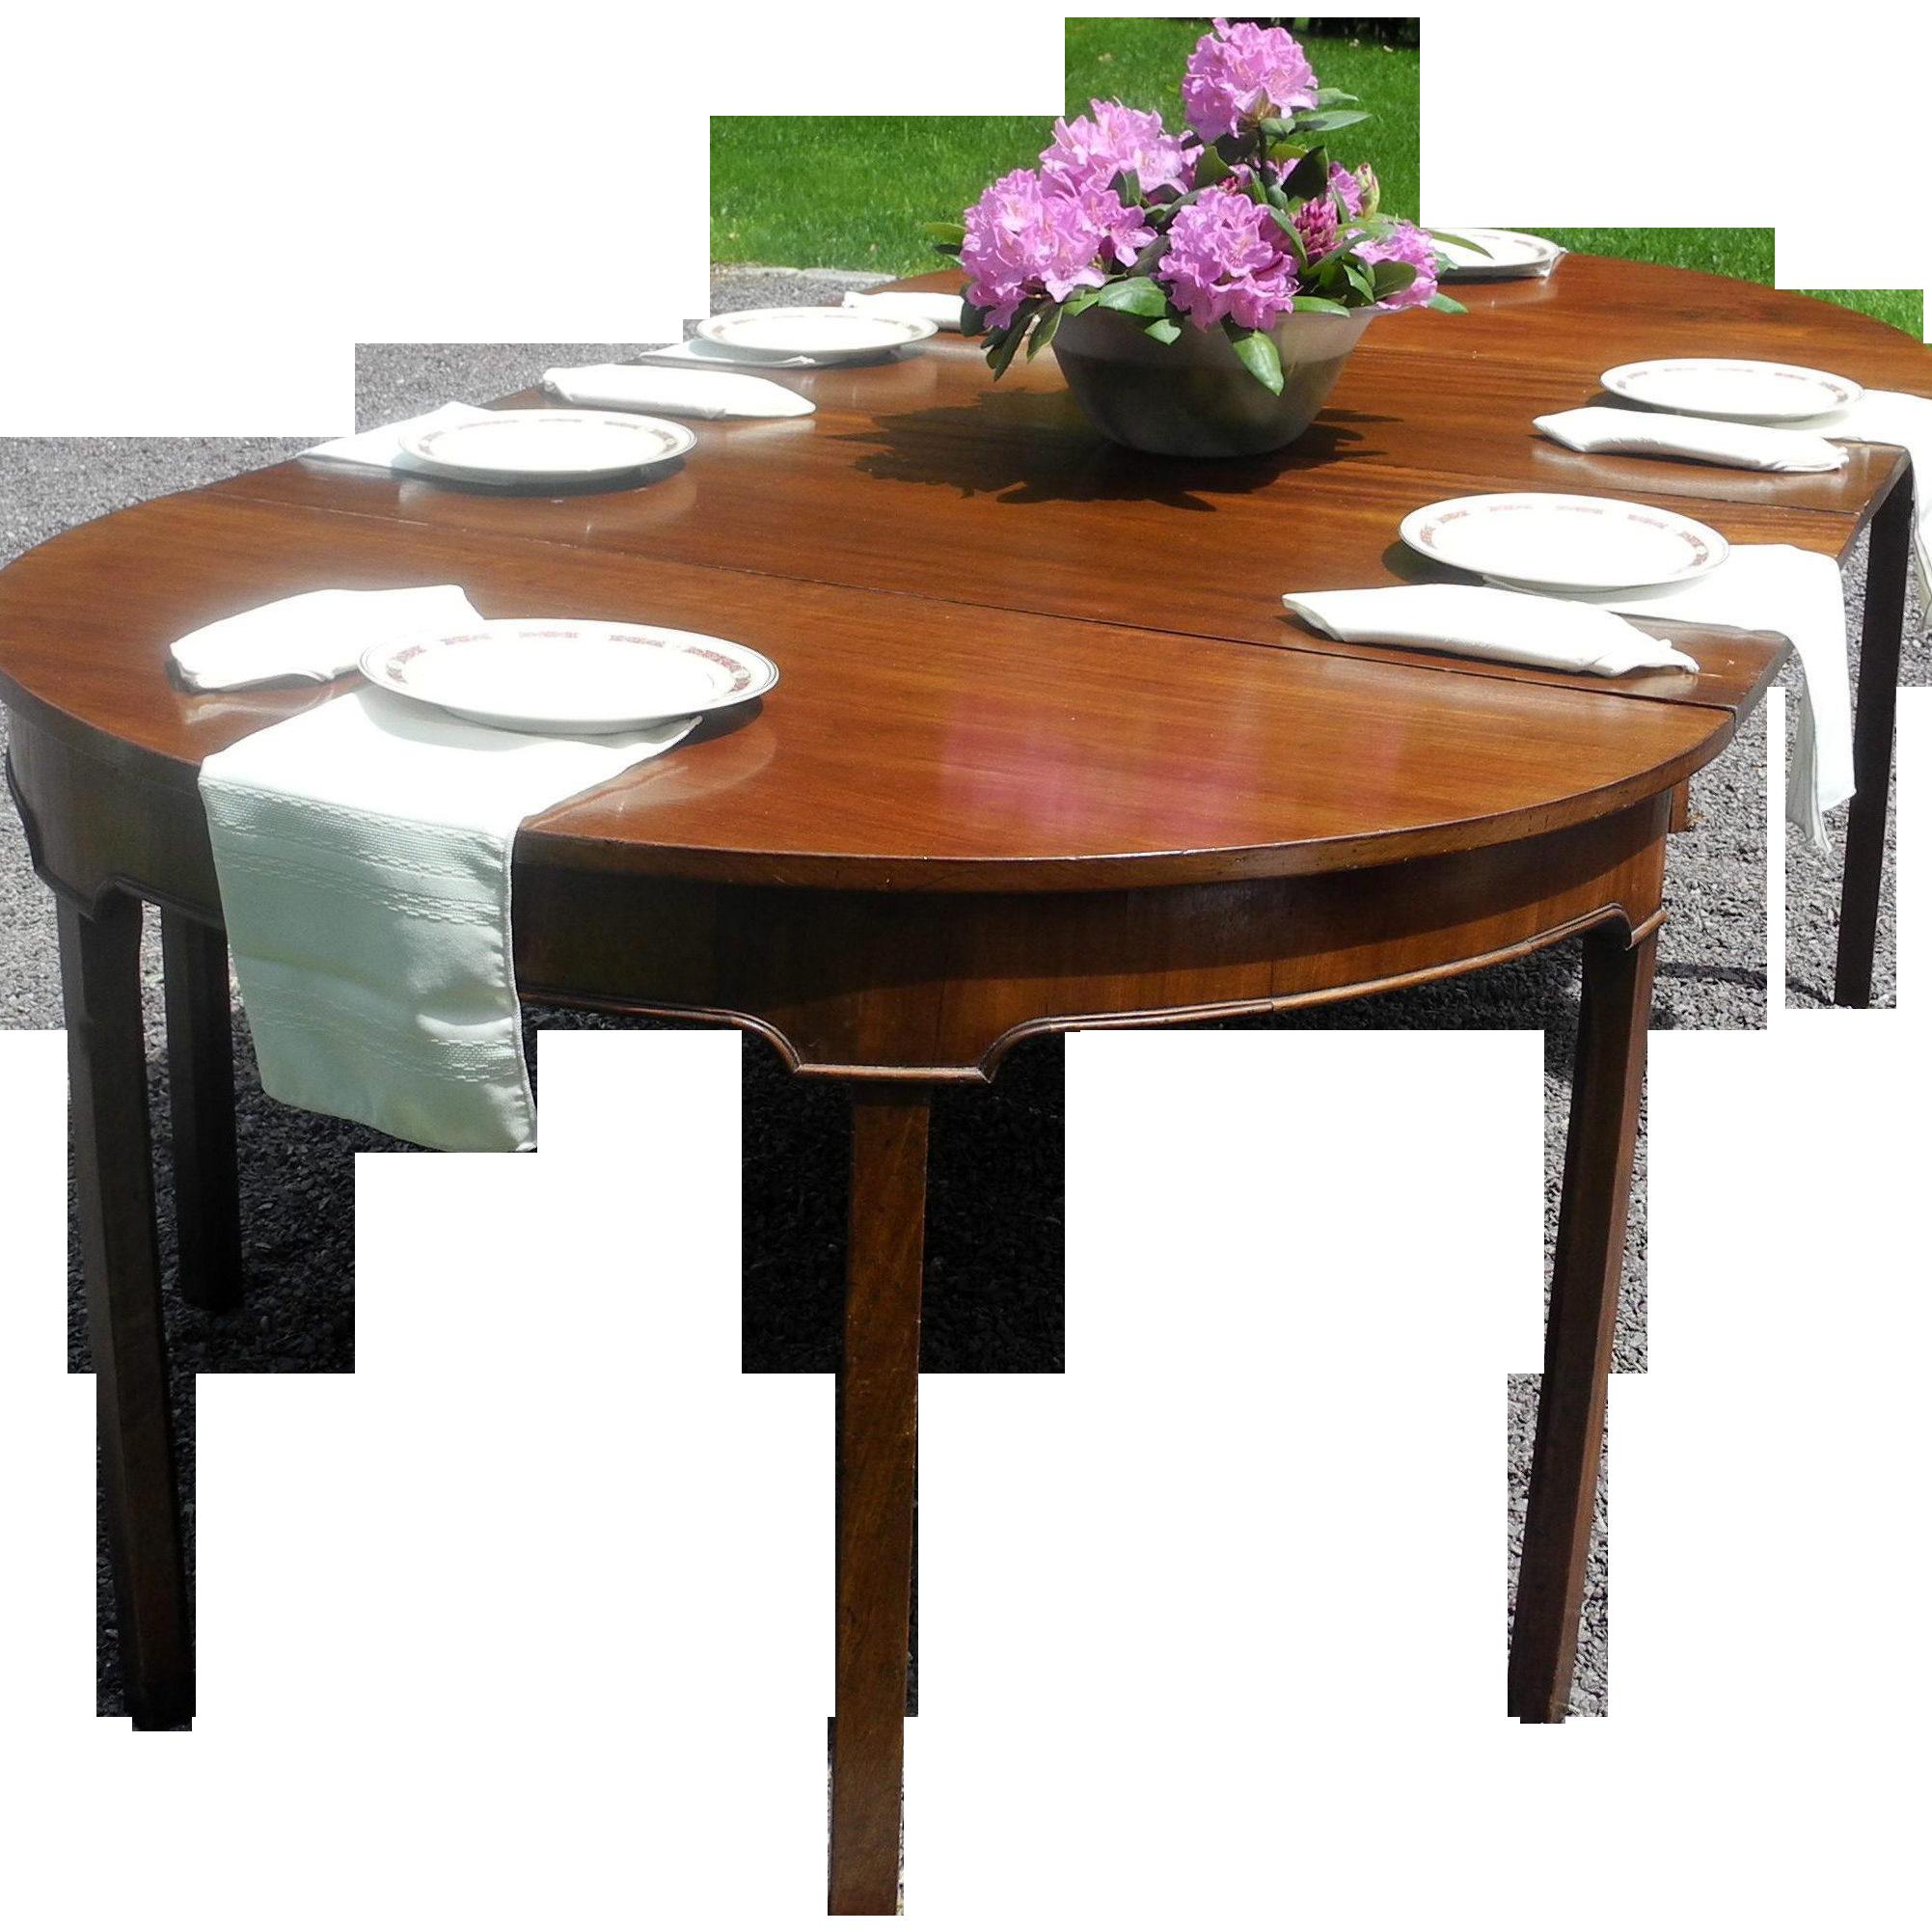 1800's Mahogany Hepplewhite Table